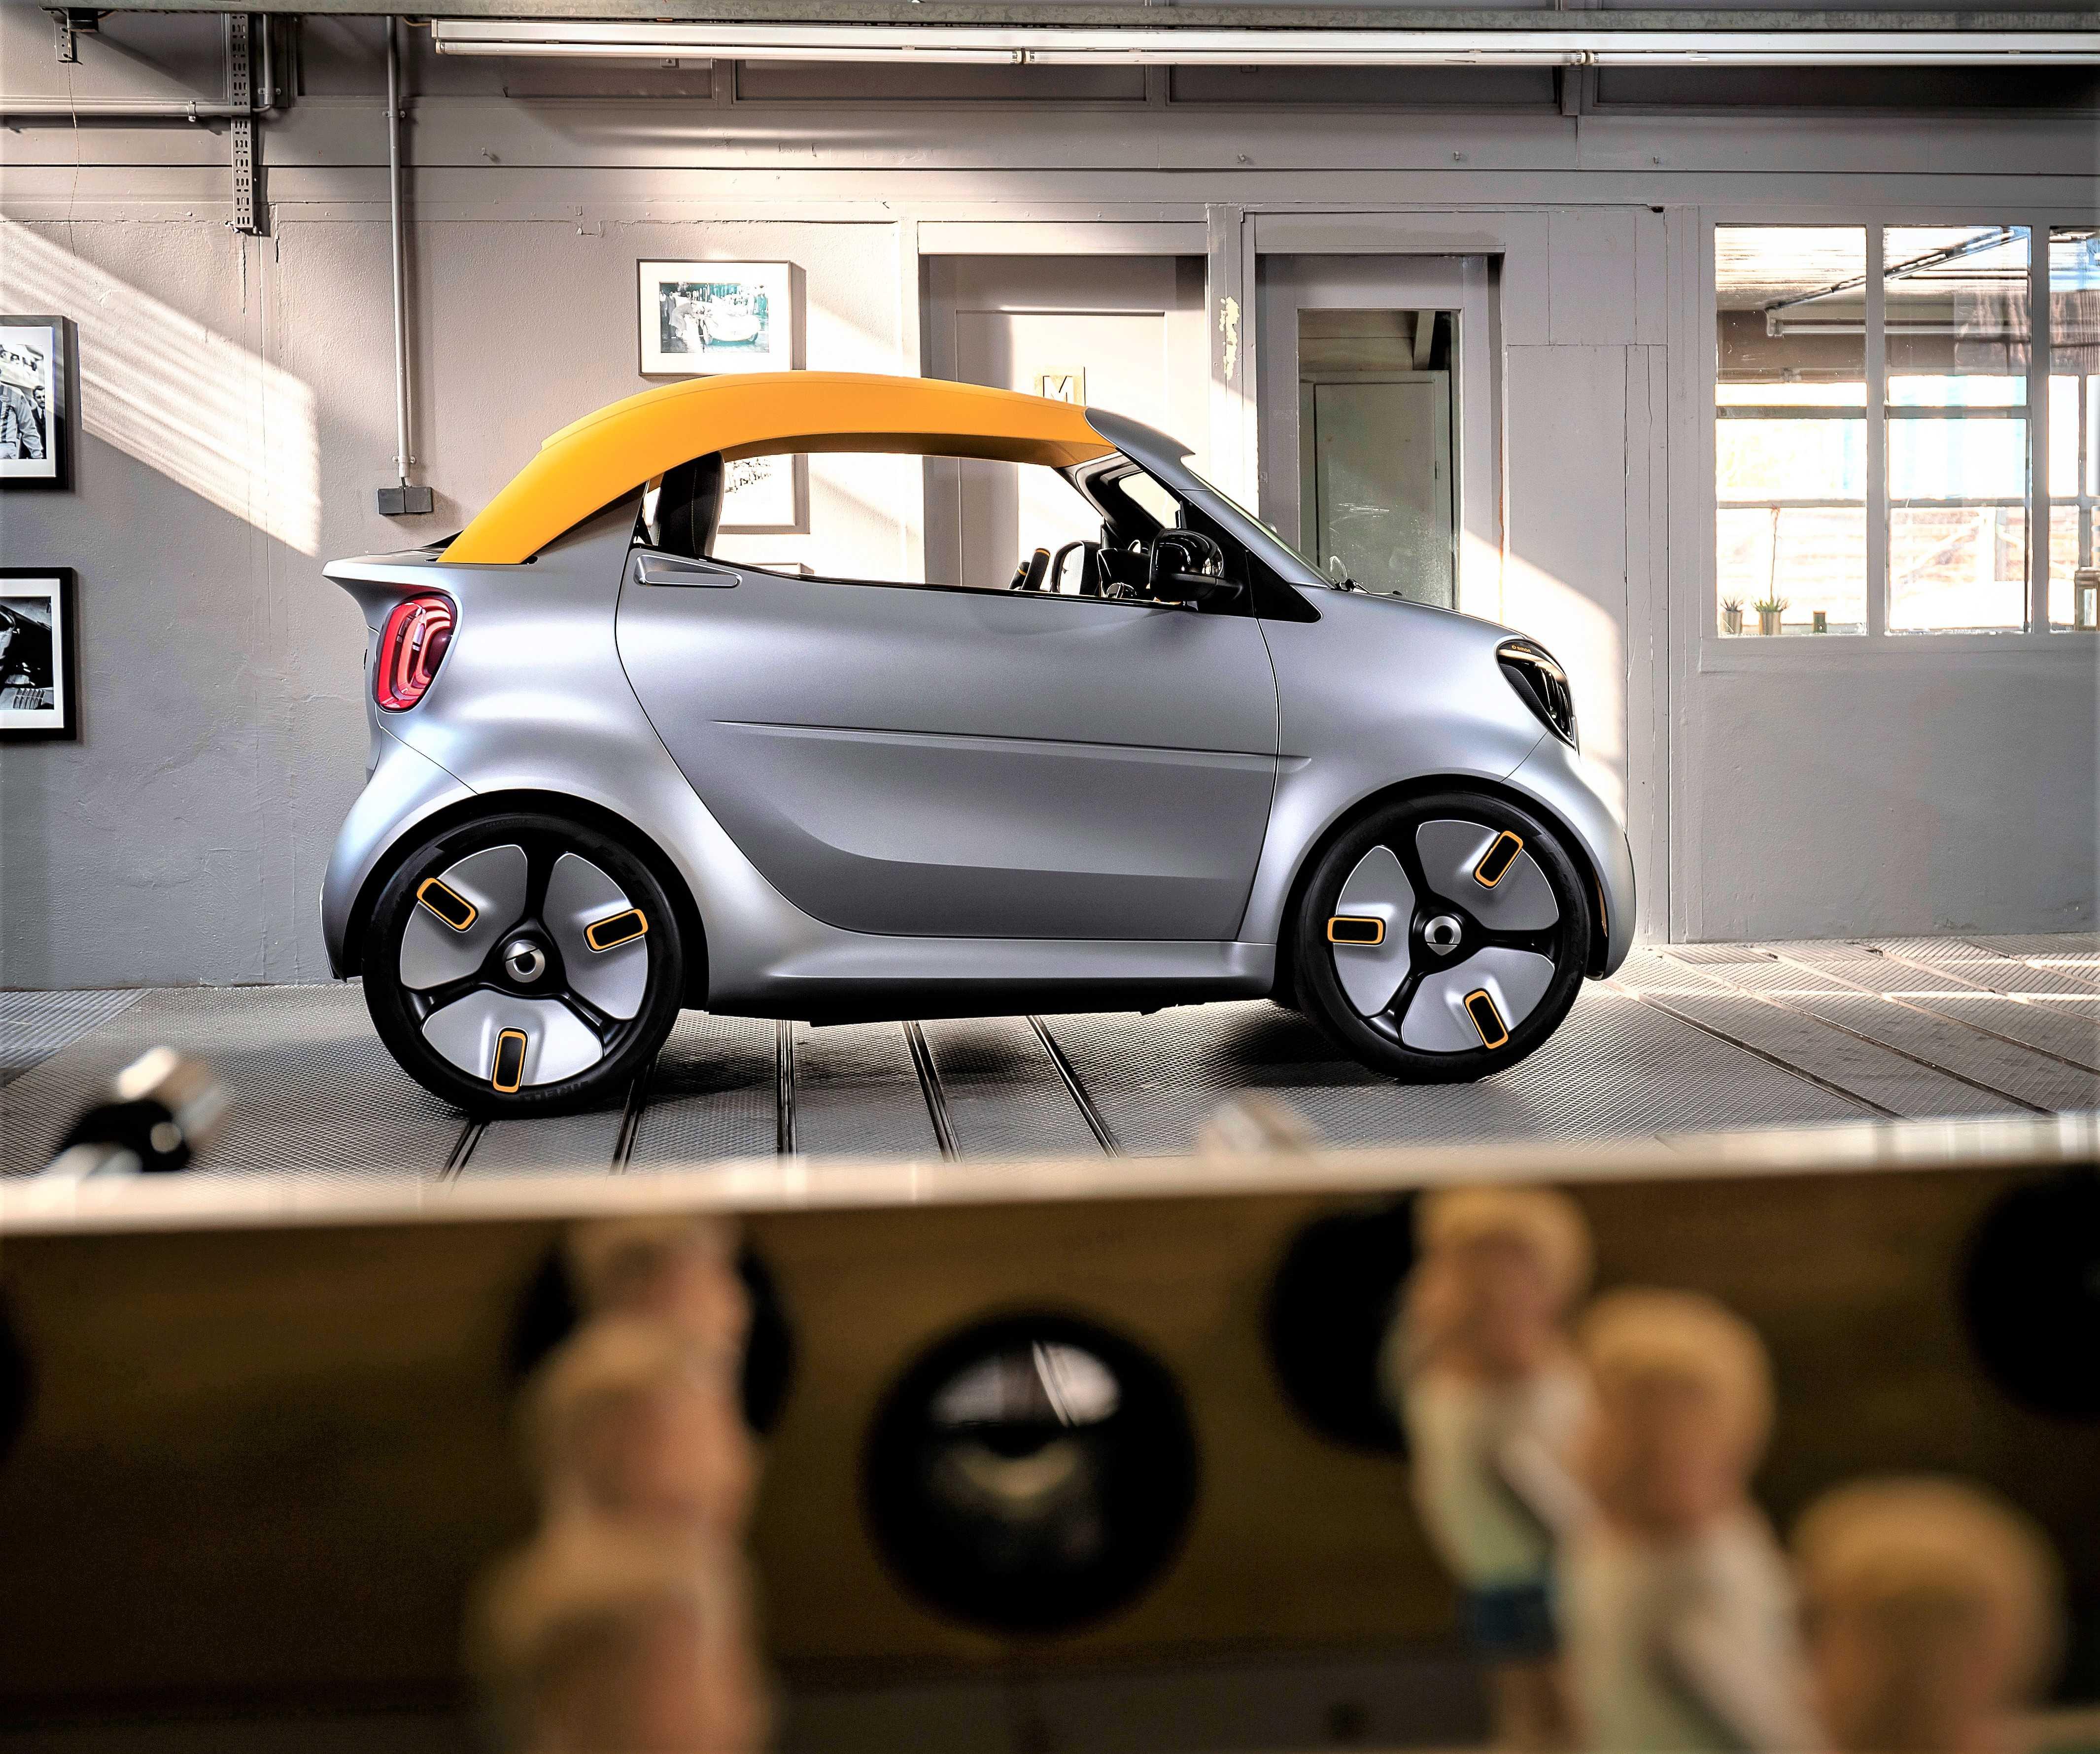 Smart fortwo hatchback-3d (смарт форту хэтчбек 3 дв.)